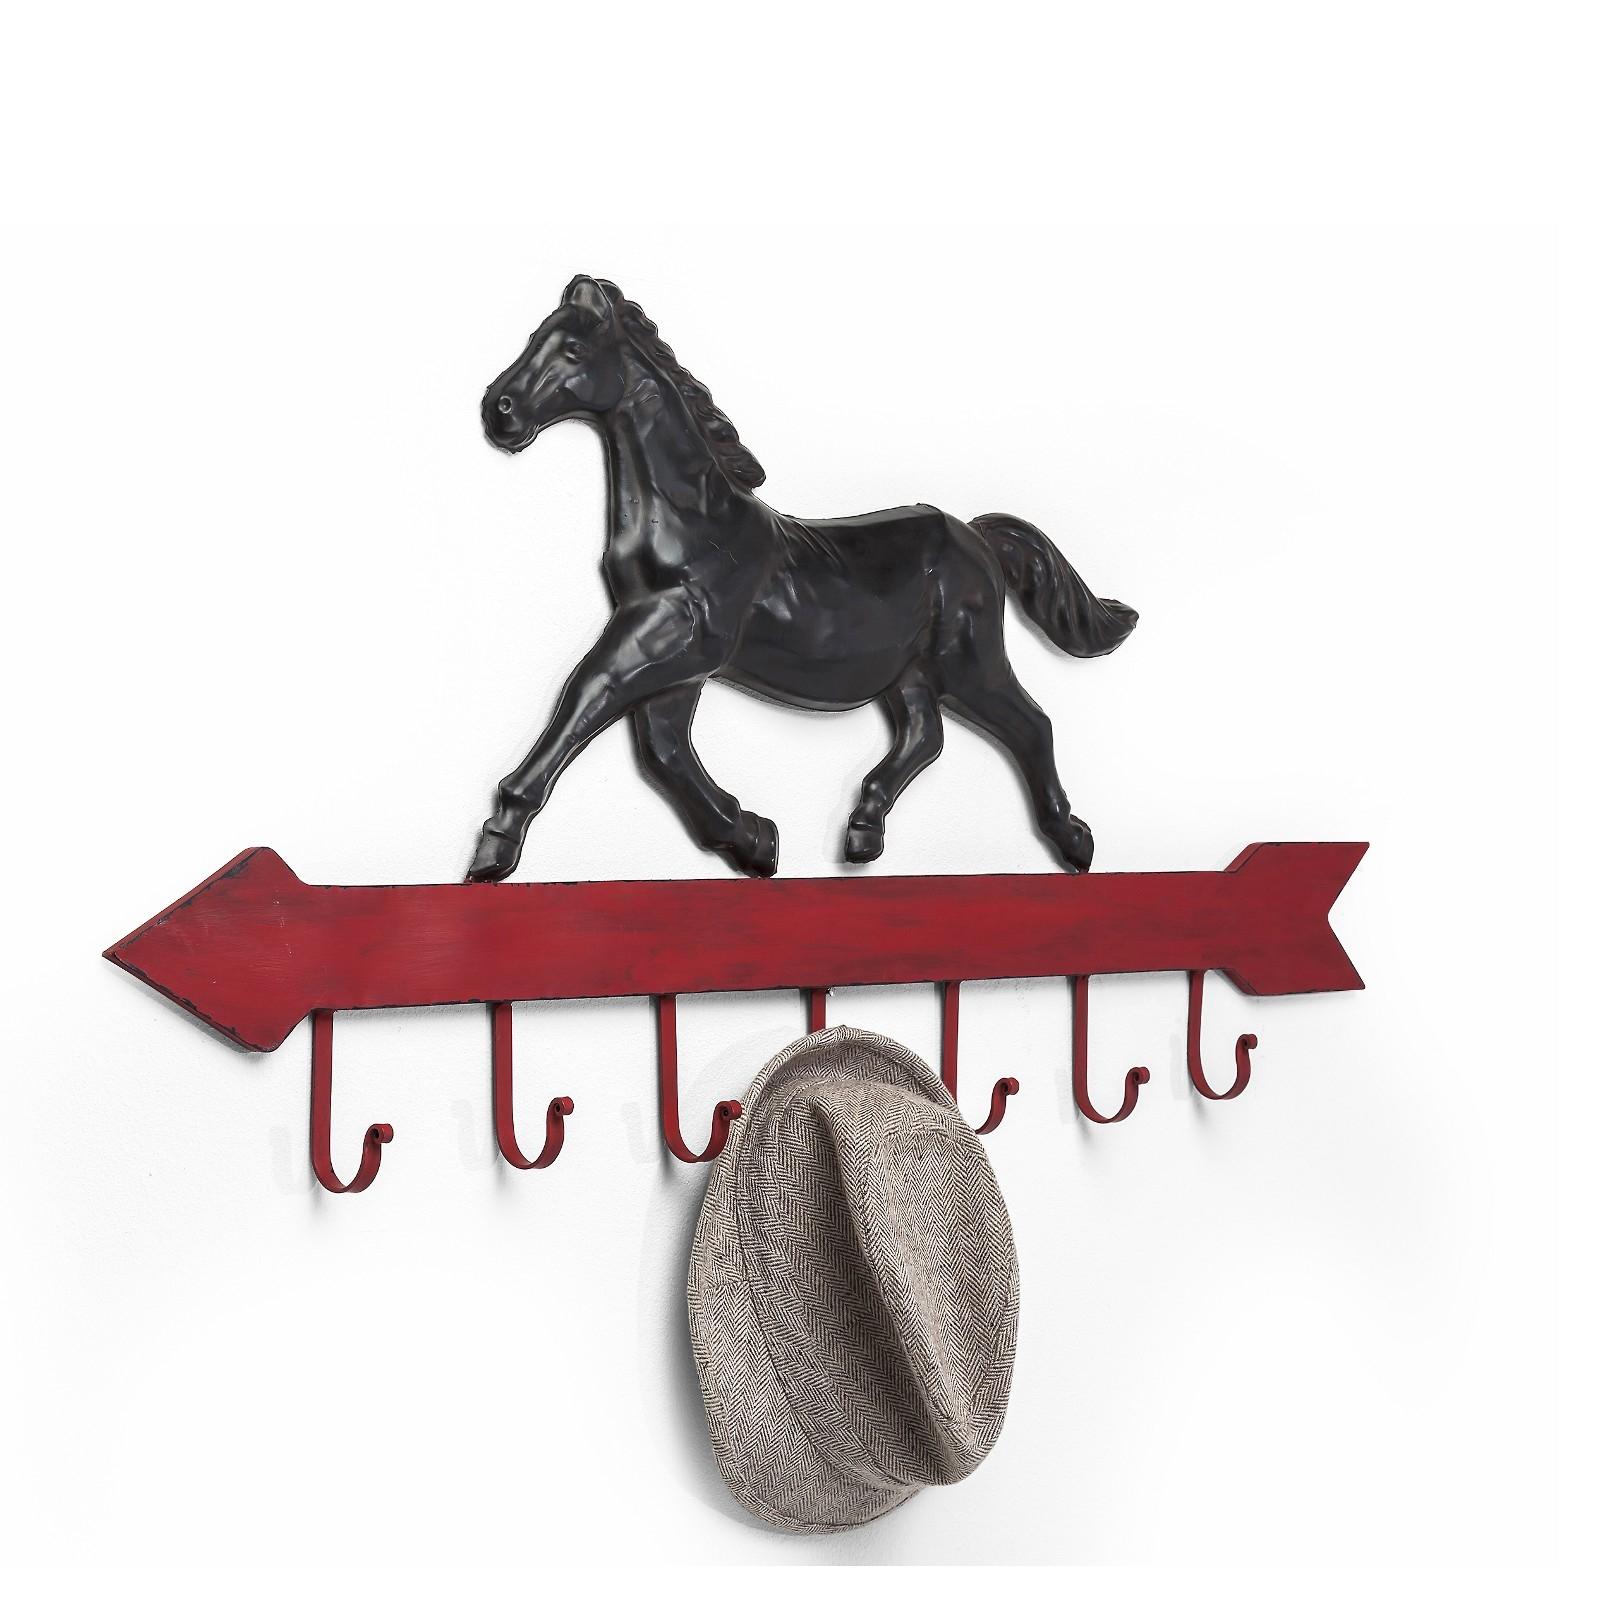 "WANDGARDEROBE /""GALOPP/"" Wandgarderobe mit Pferd 99 cm Eisen mit 7 Haken"